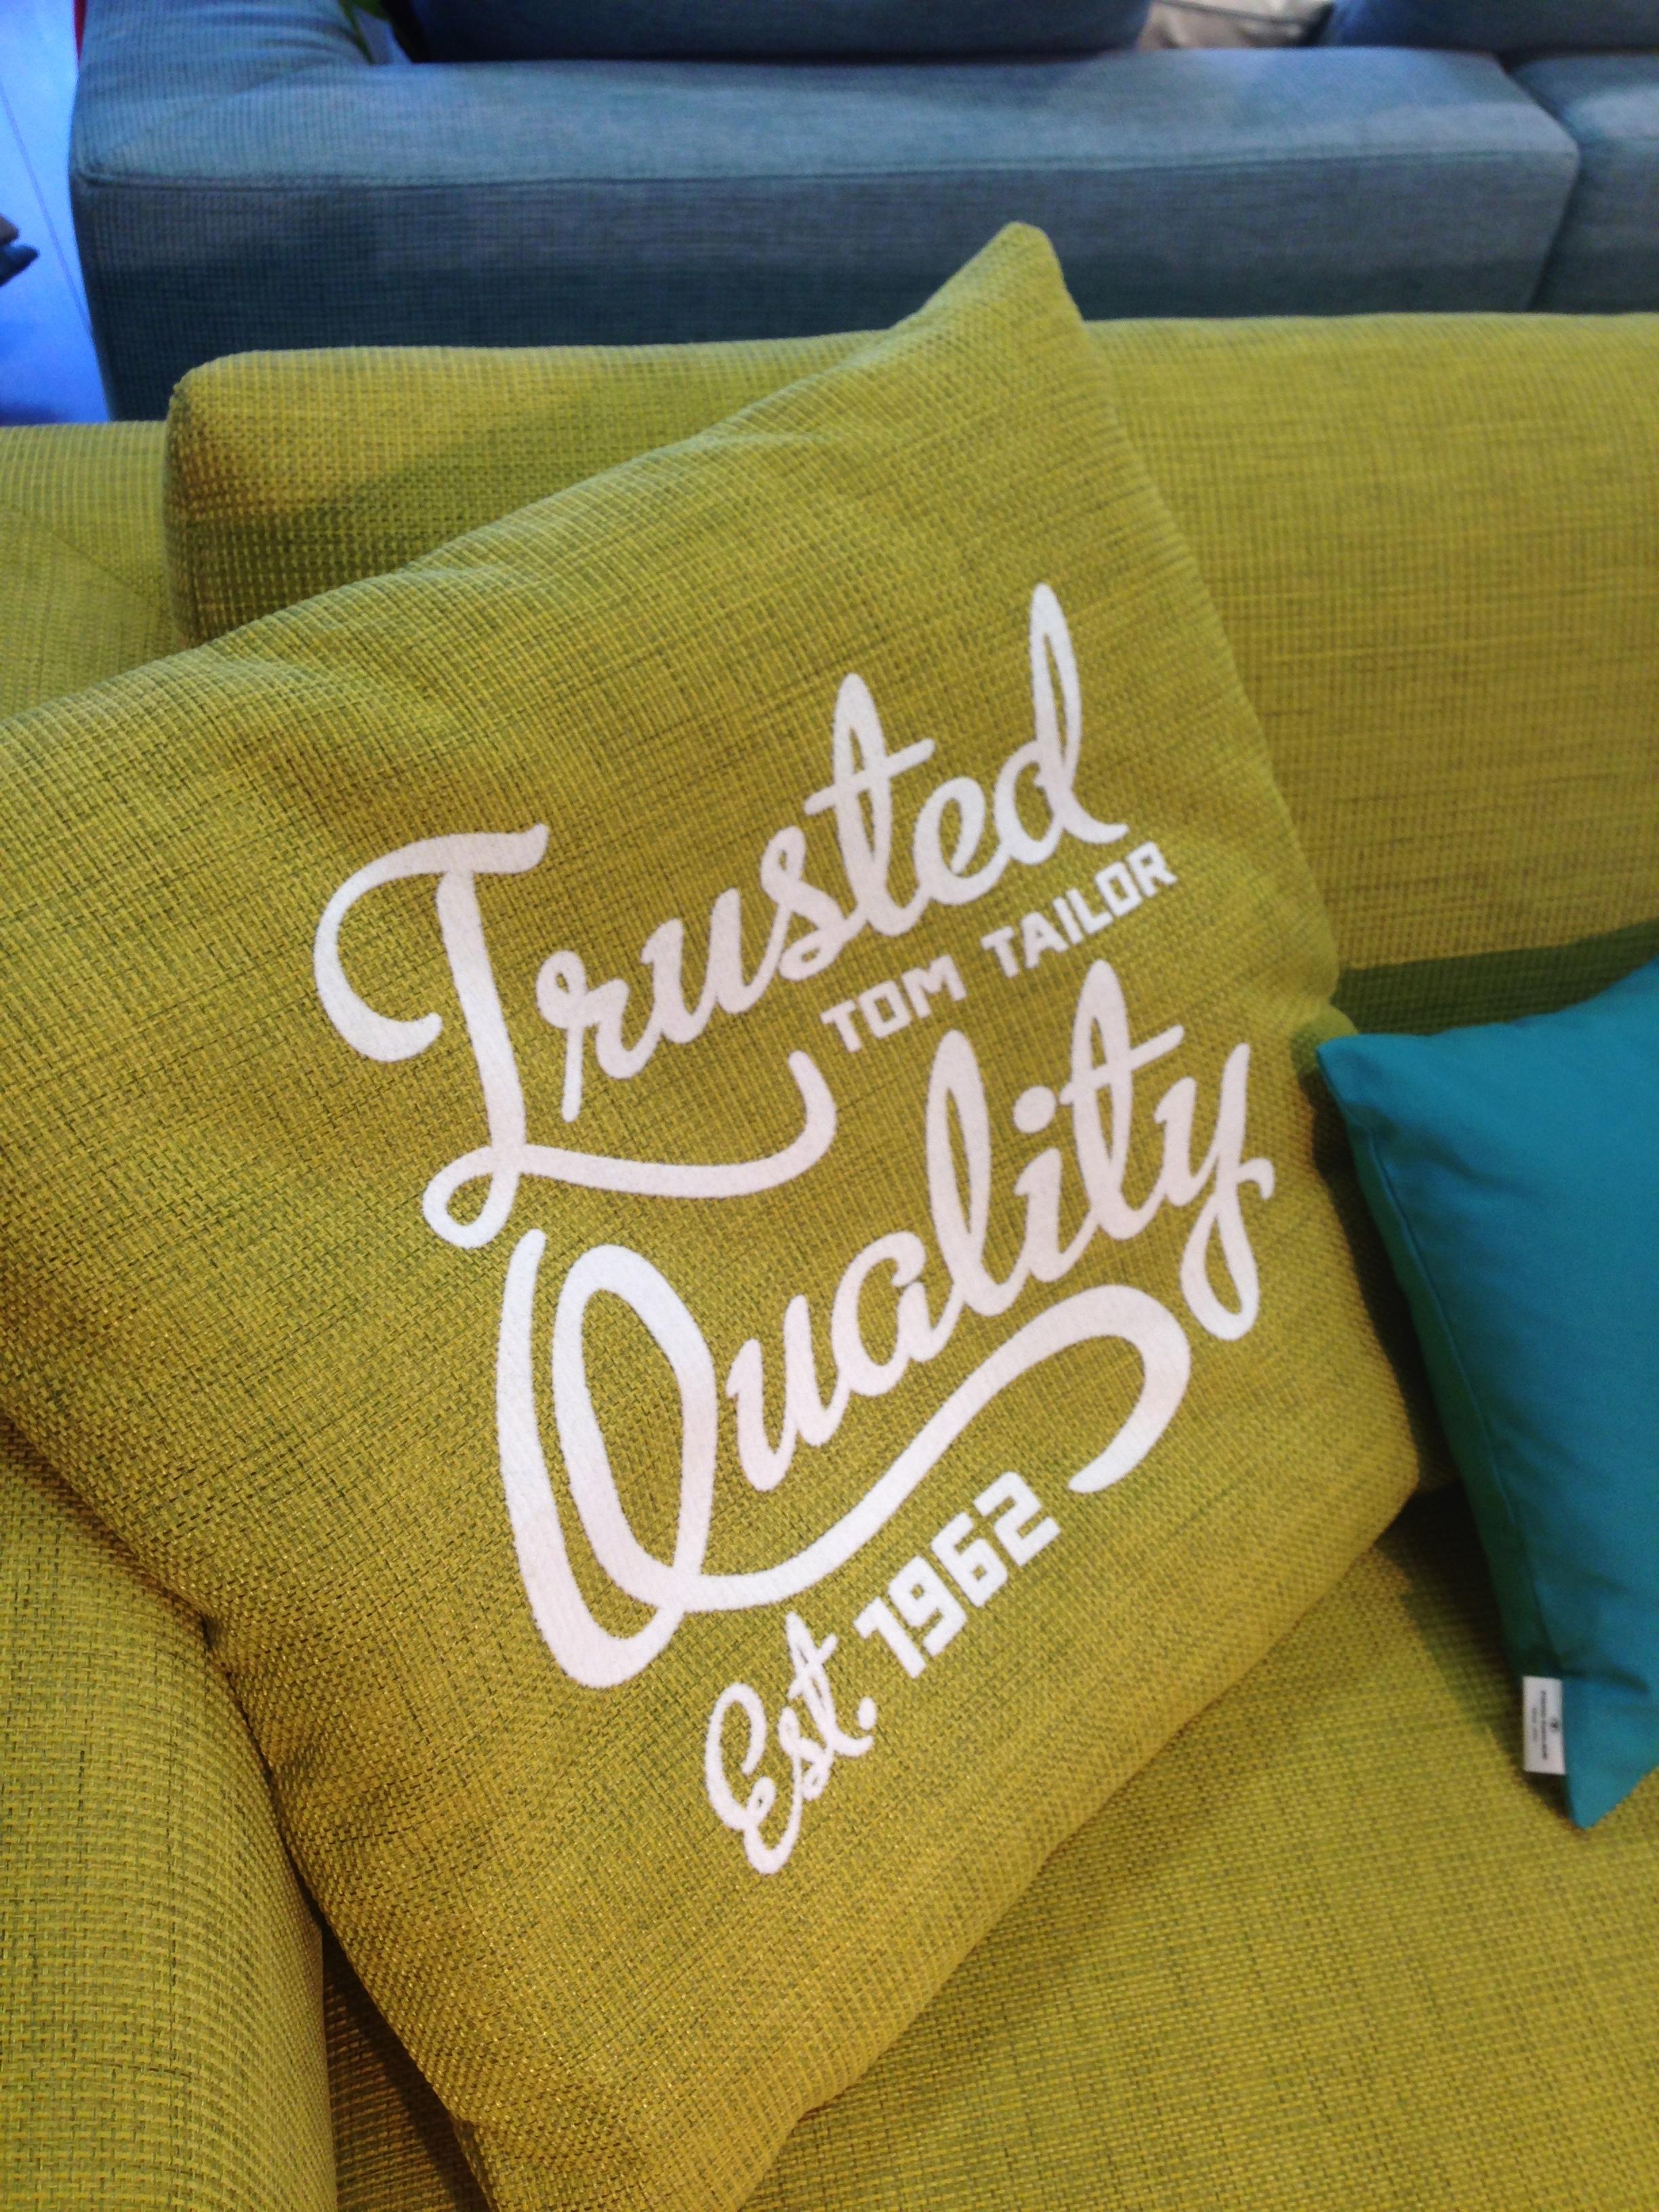 tom tailor colors new colorful sofa range fashionable. Black Bedroom Furniture Sets. Home Design Ideas